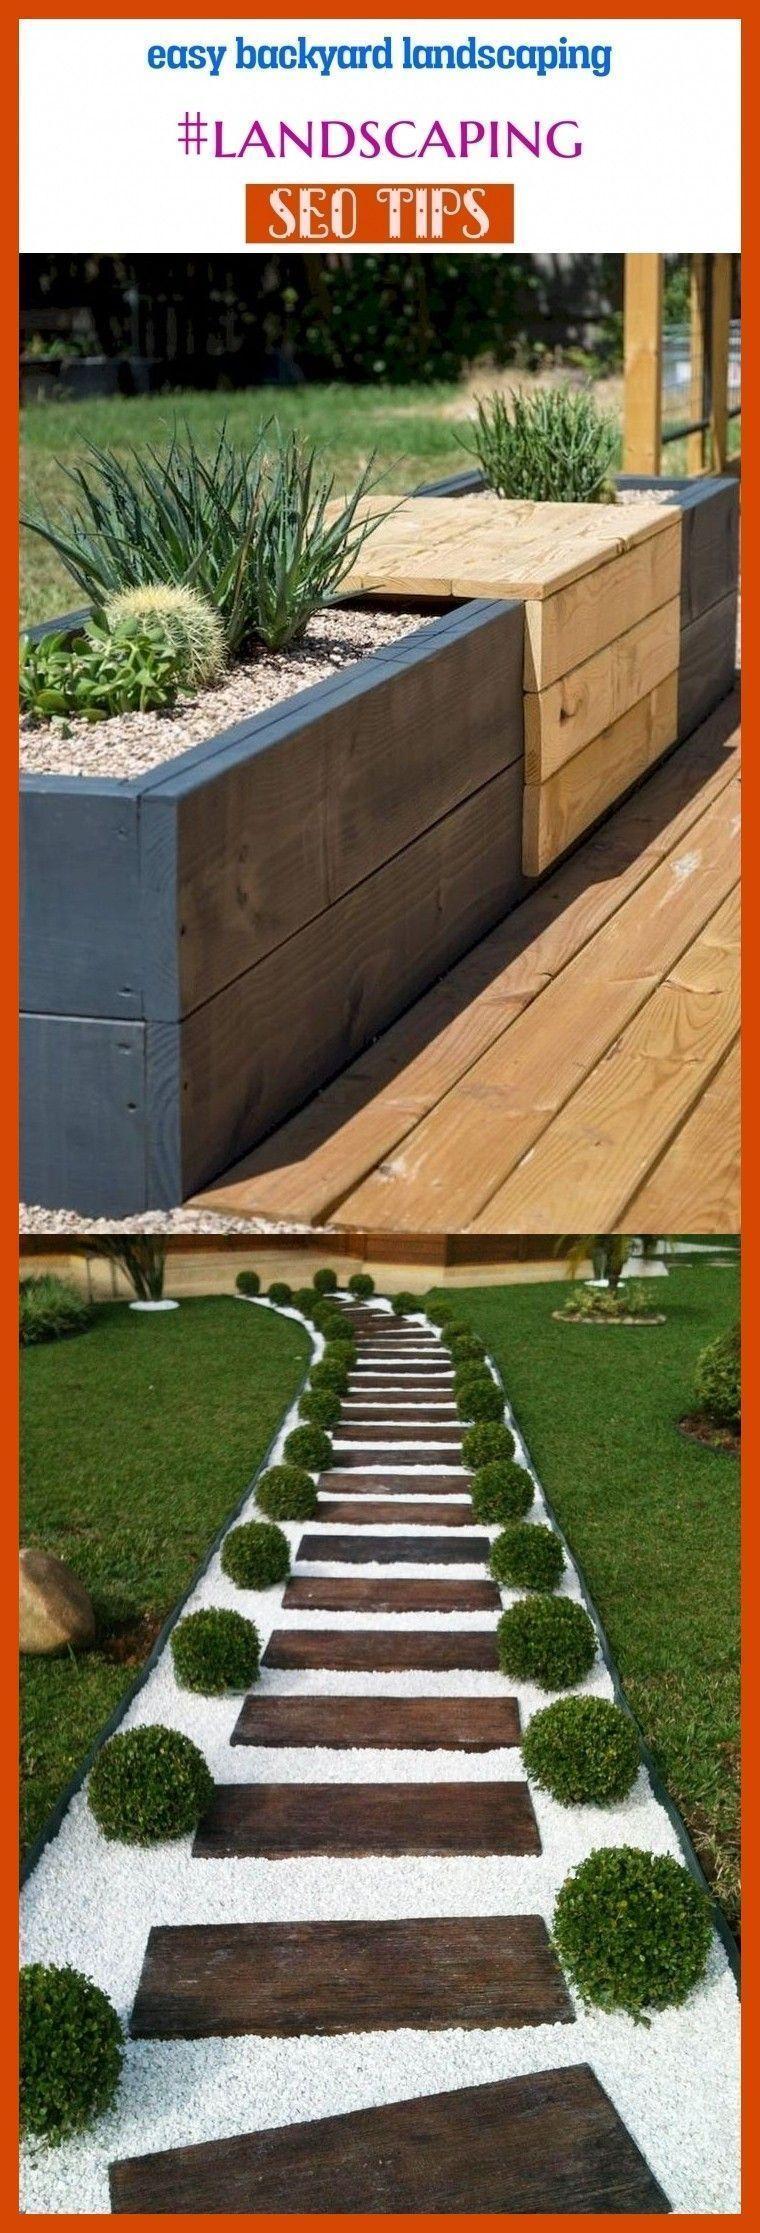 Simple Garden Design # Landscaping # Keywords #Niches ...